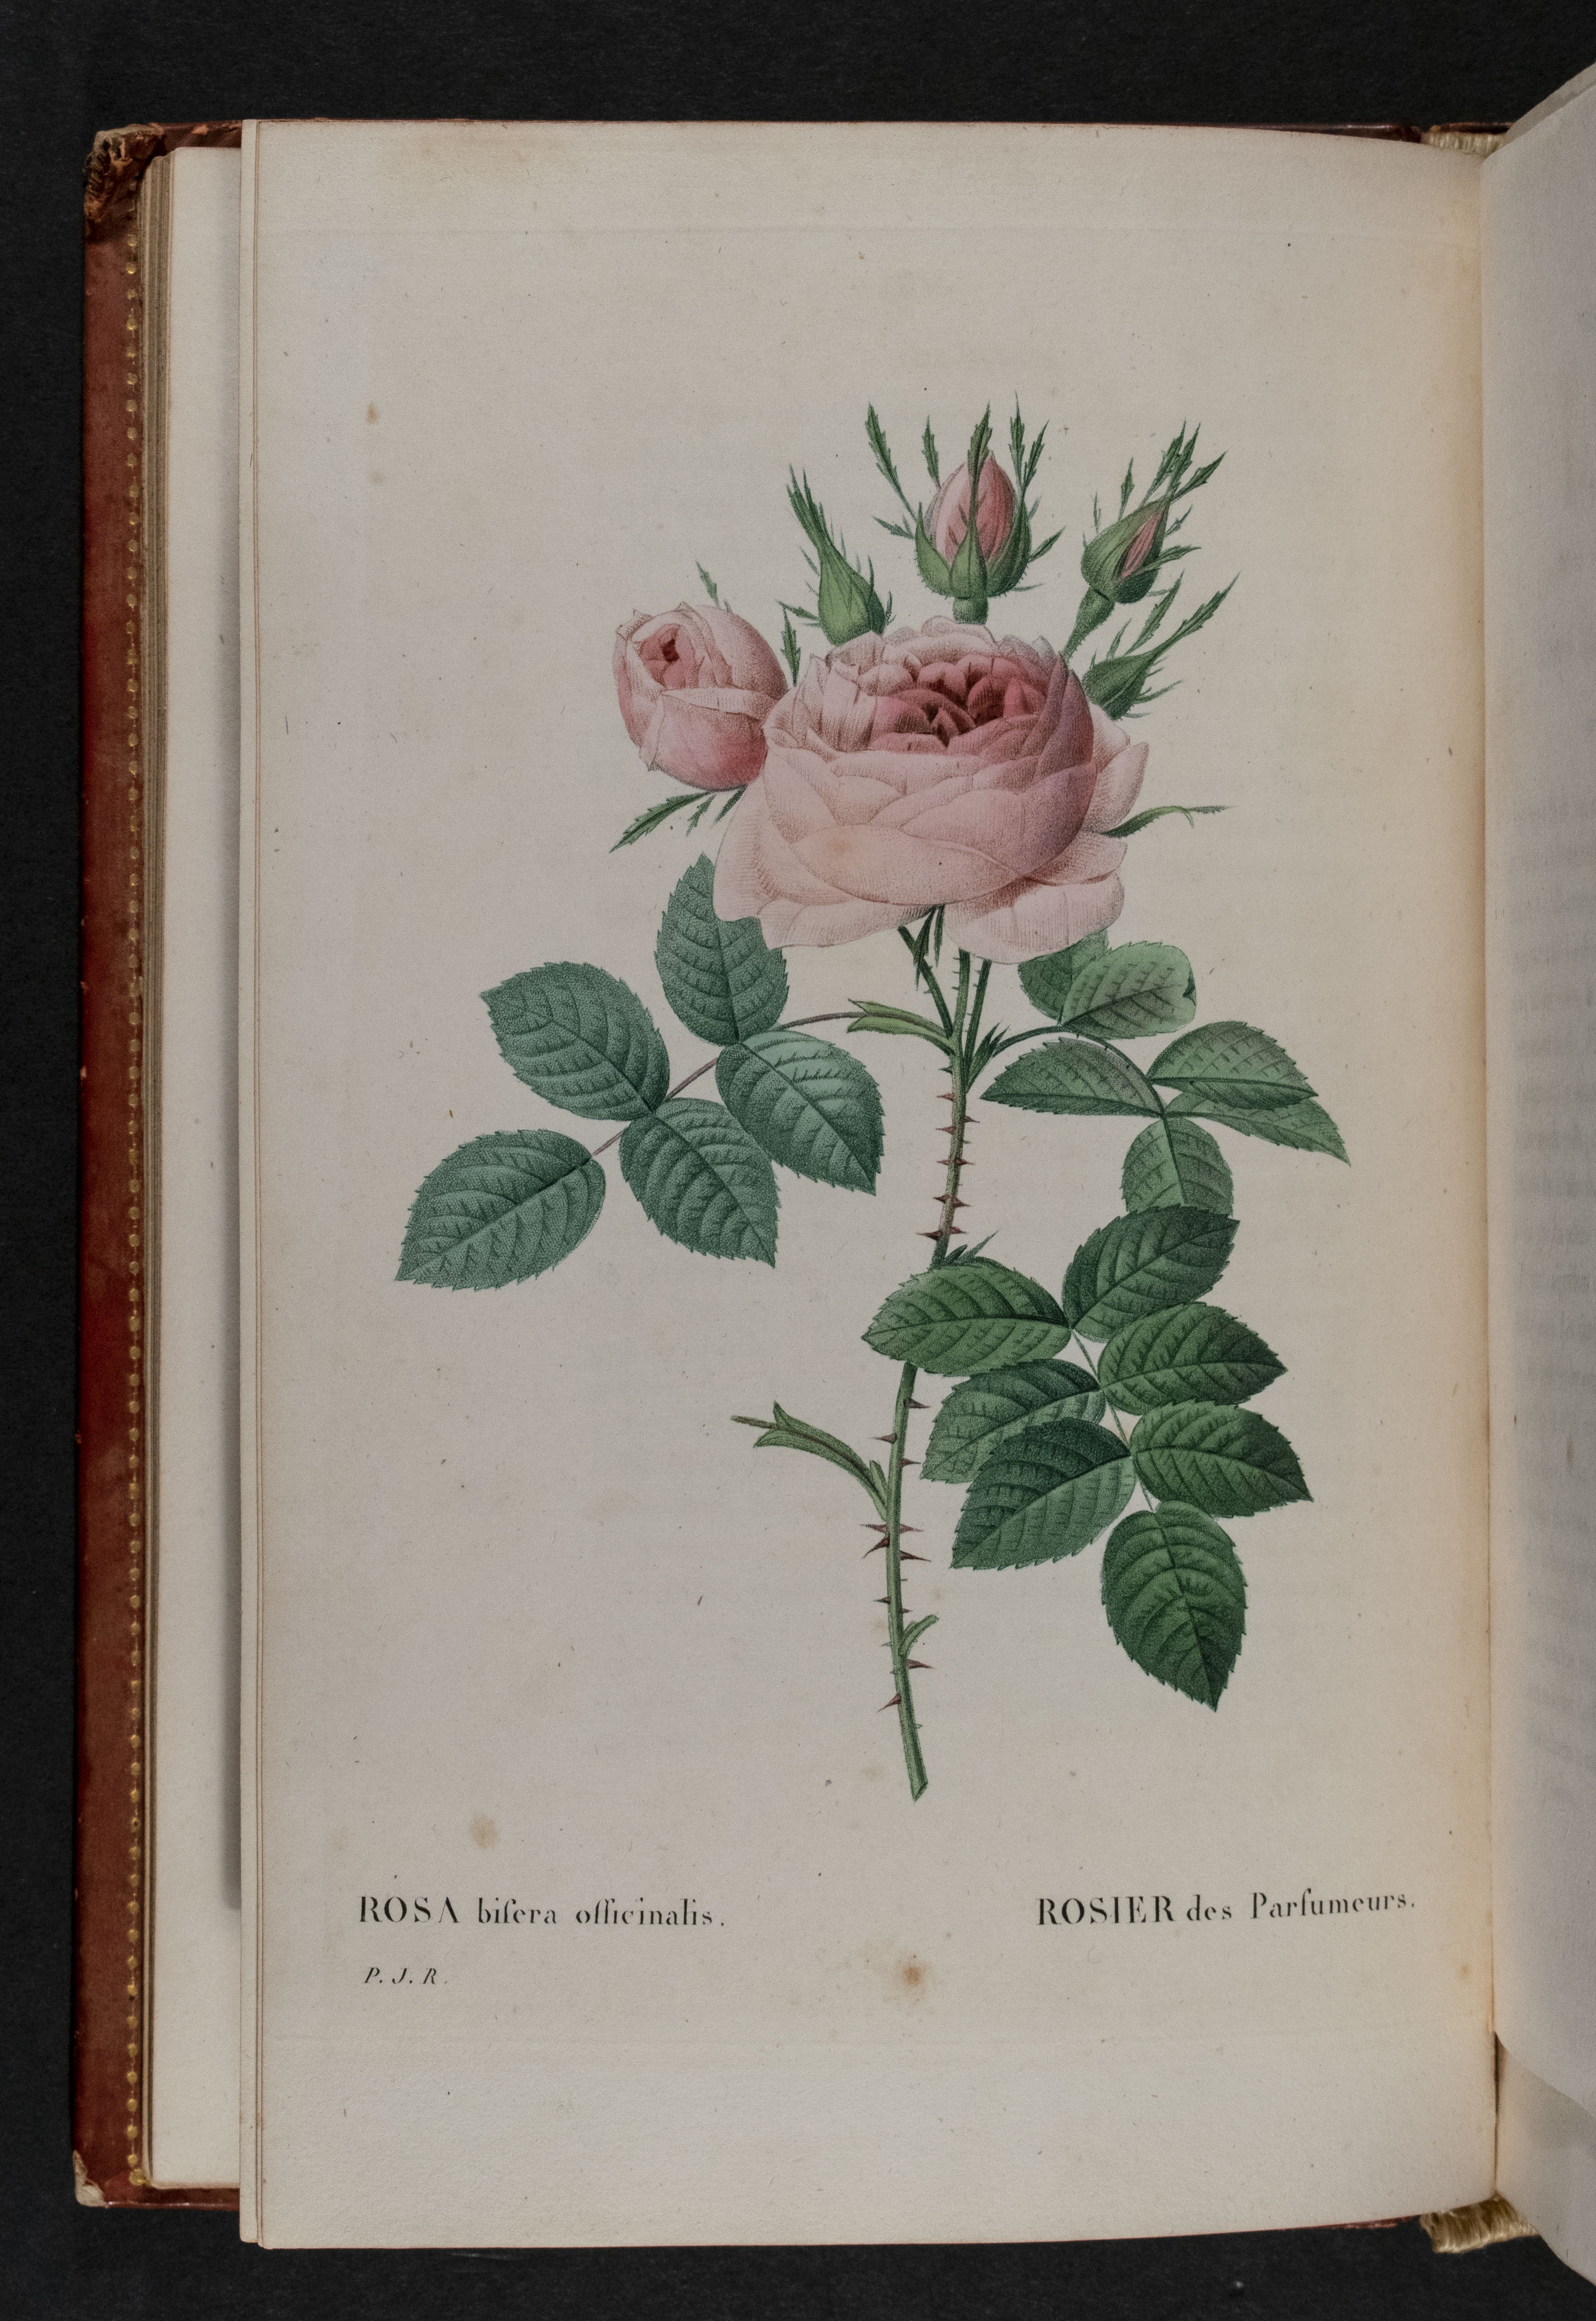 ROSA bifera officinalis/ ROSIER des Parfumeurs